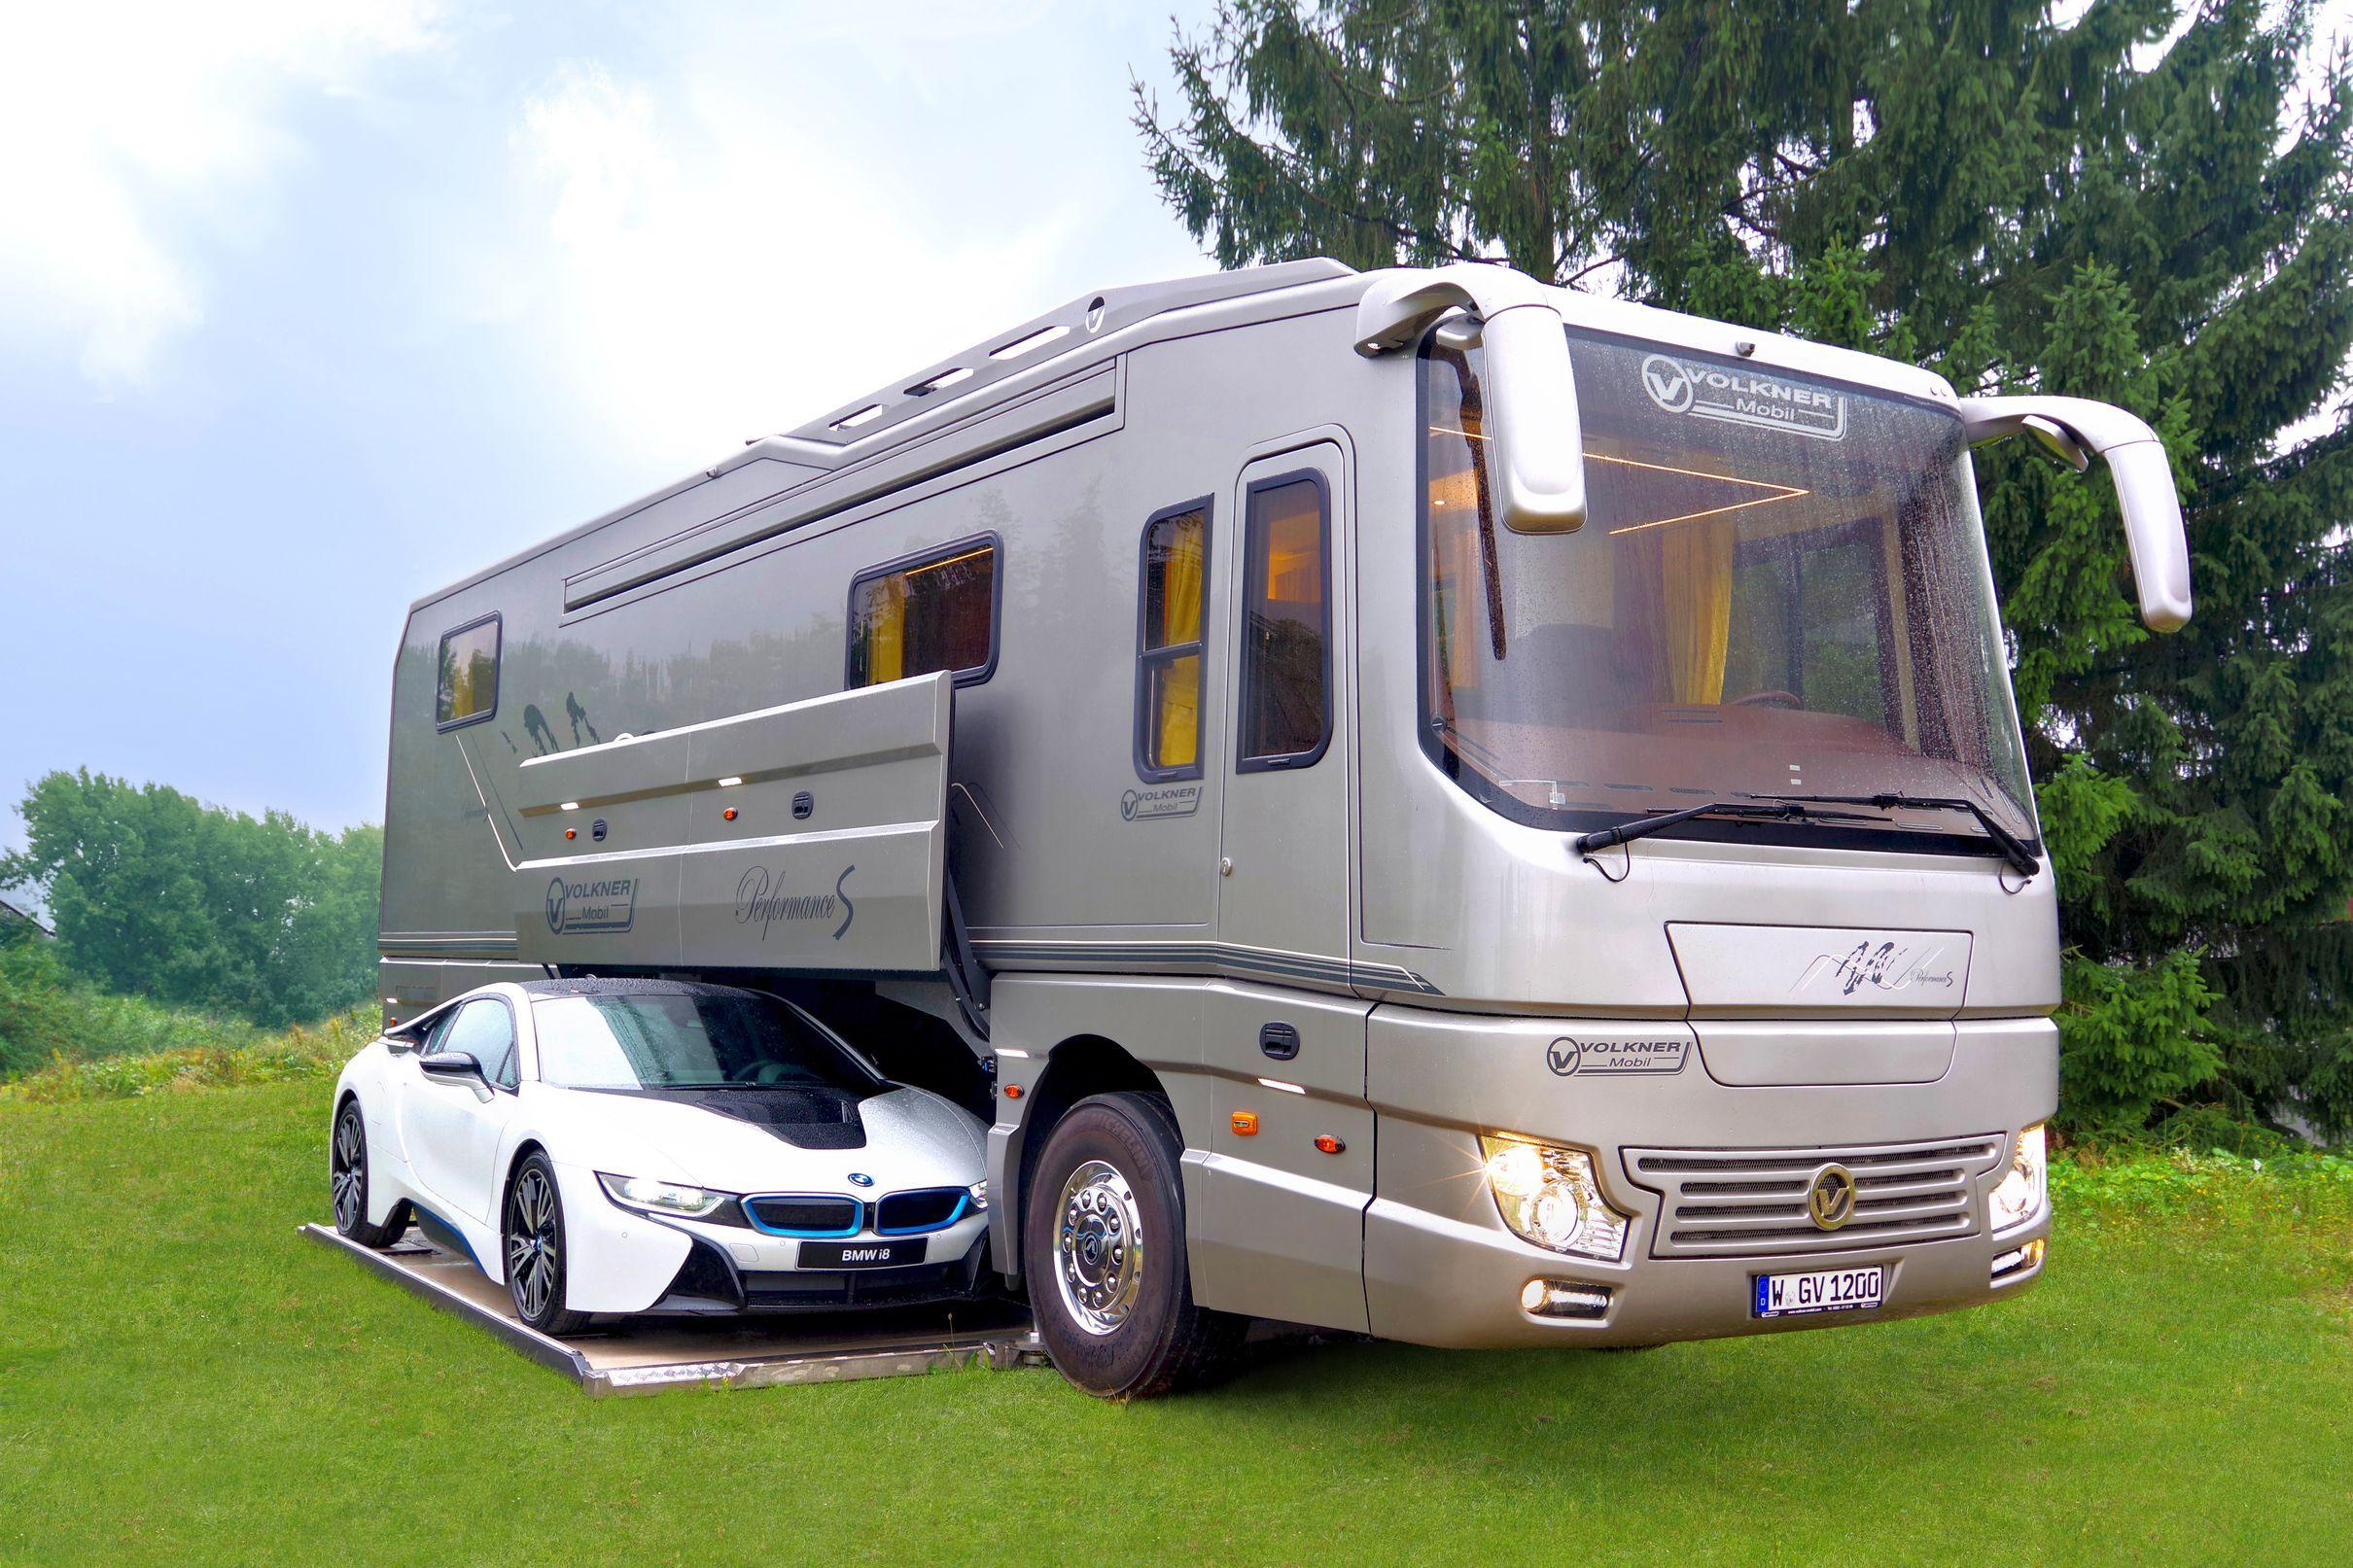 Bespoke Rv Hides Sports Car In Mobile Garage Recreational